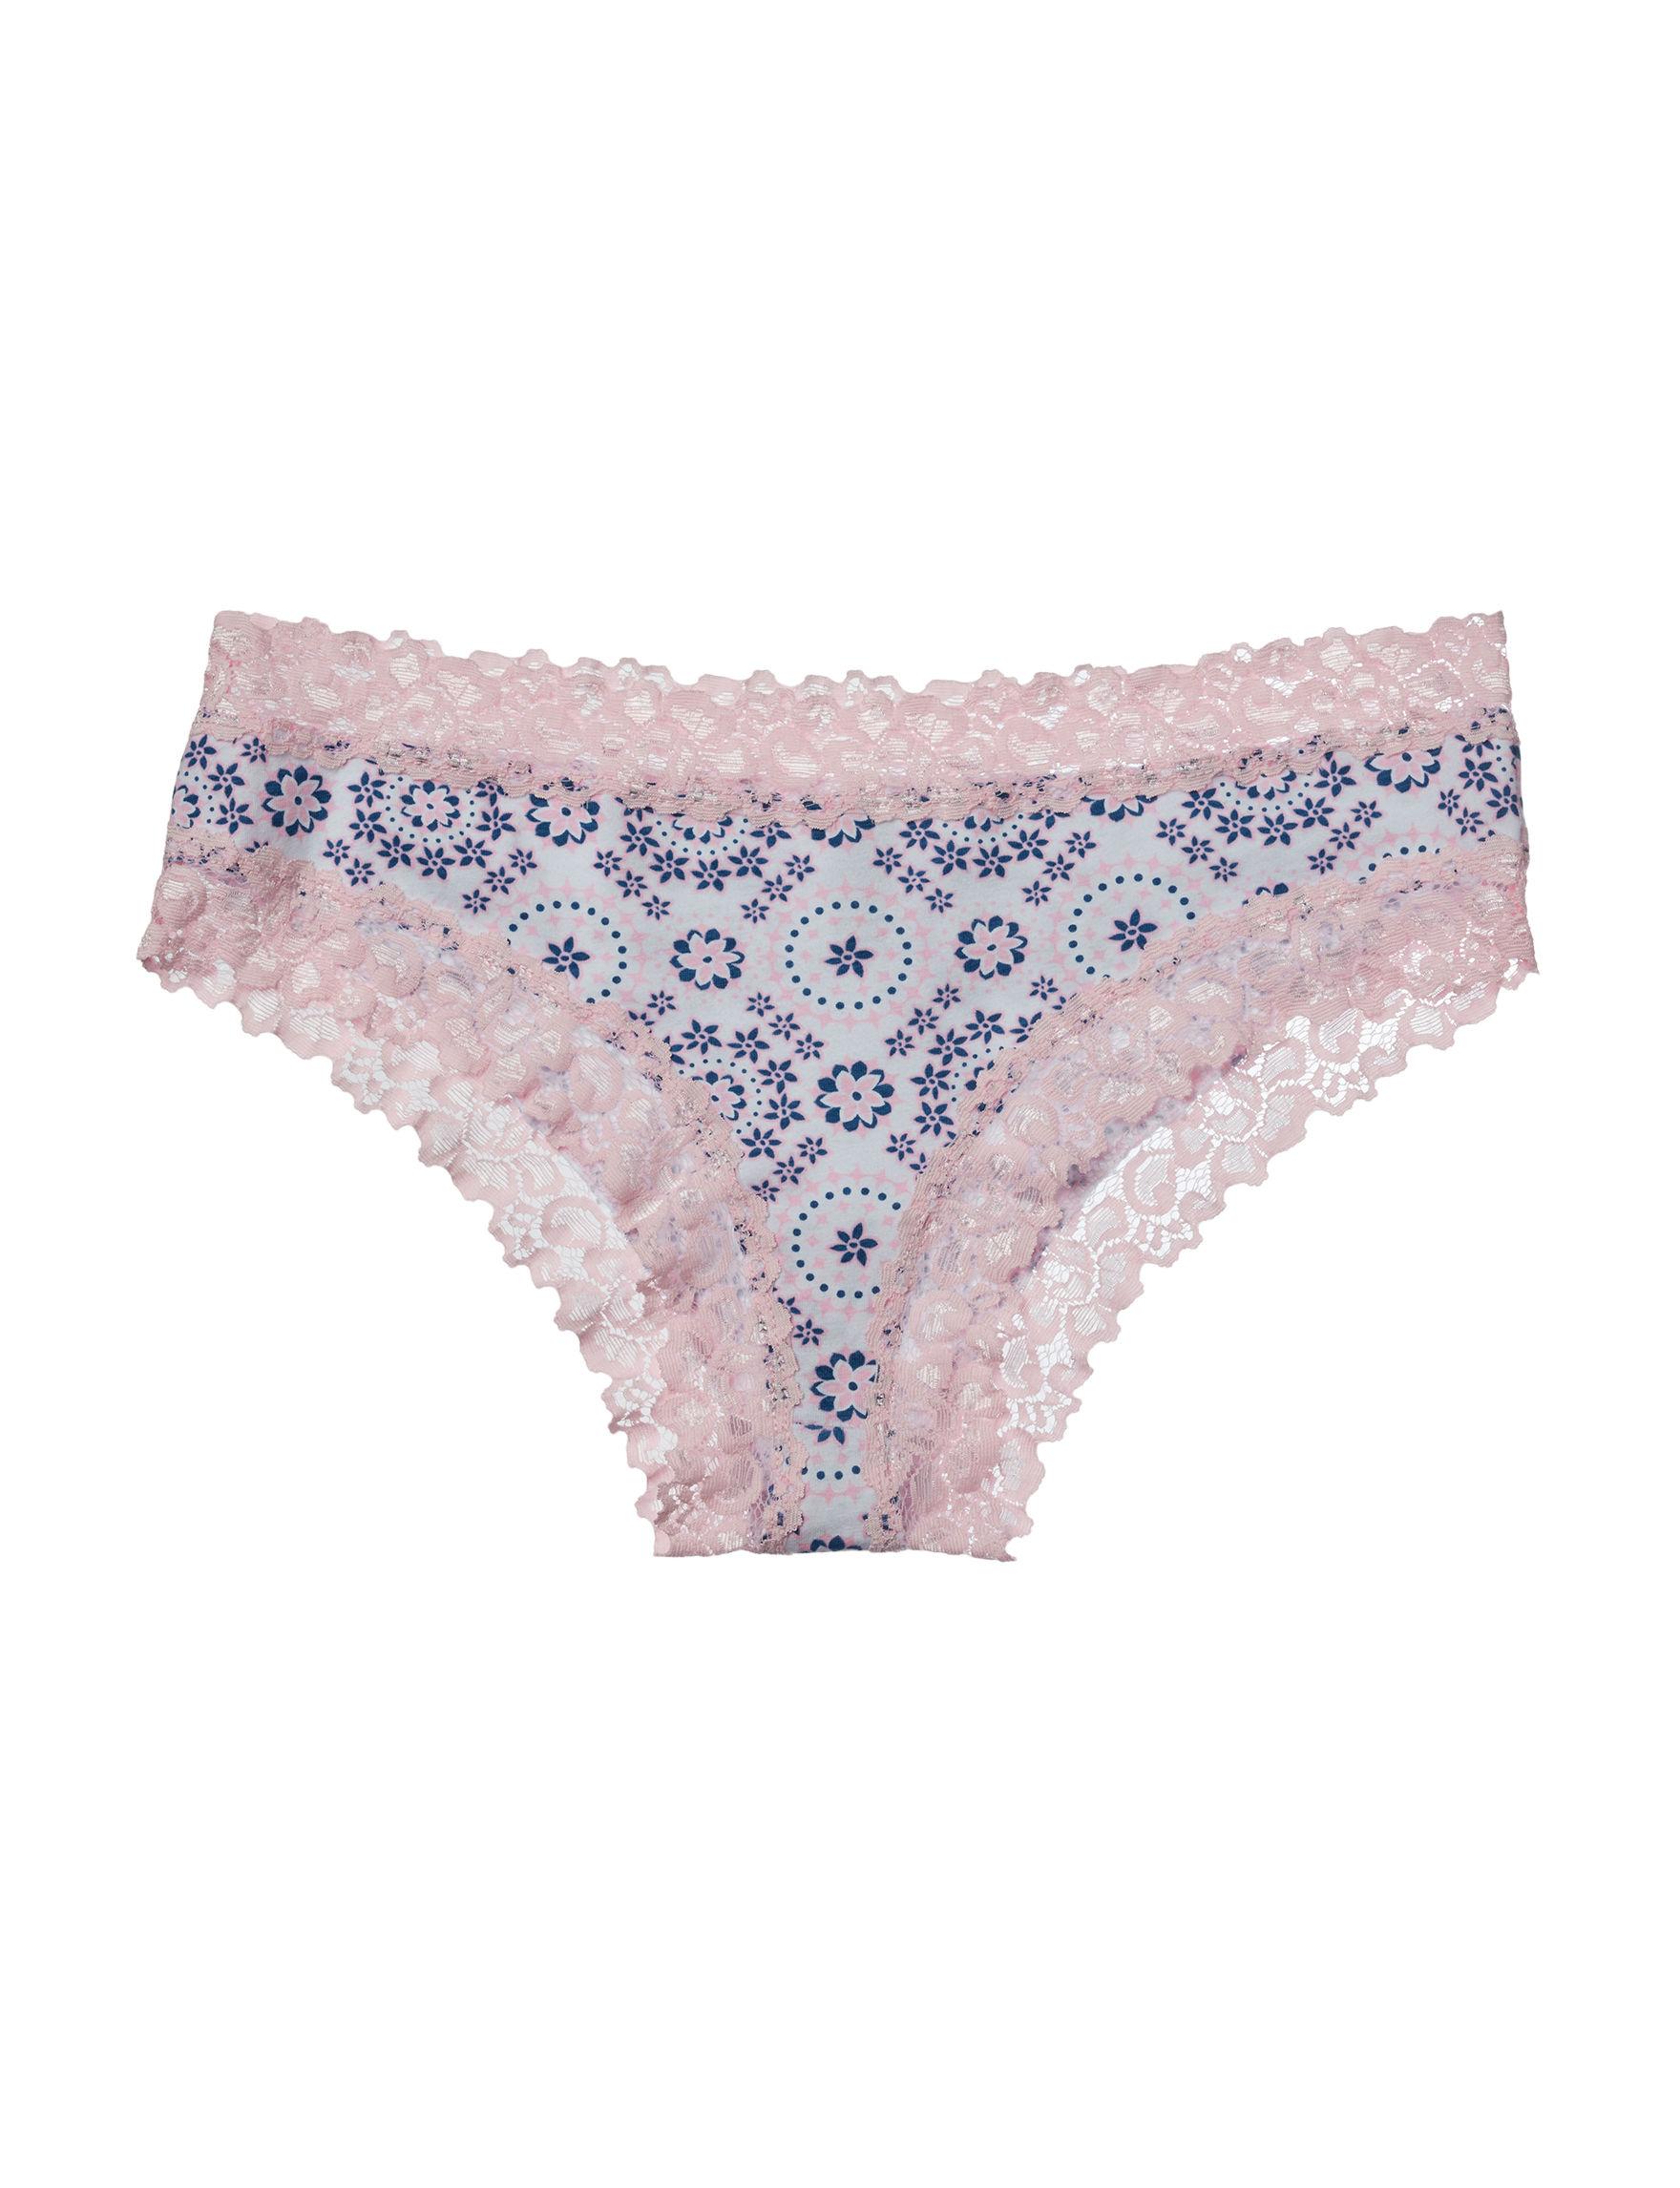 International Intimates Pink Panties Hipster